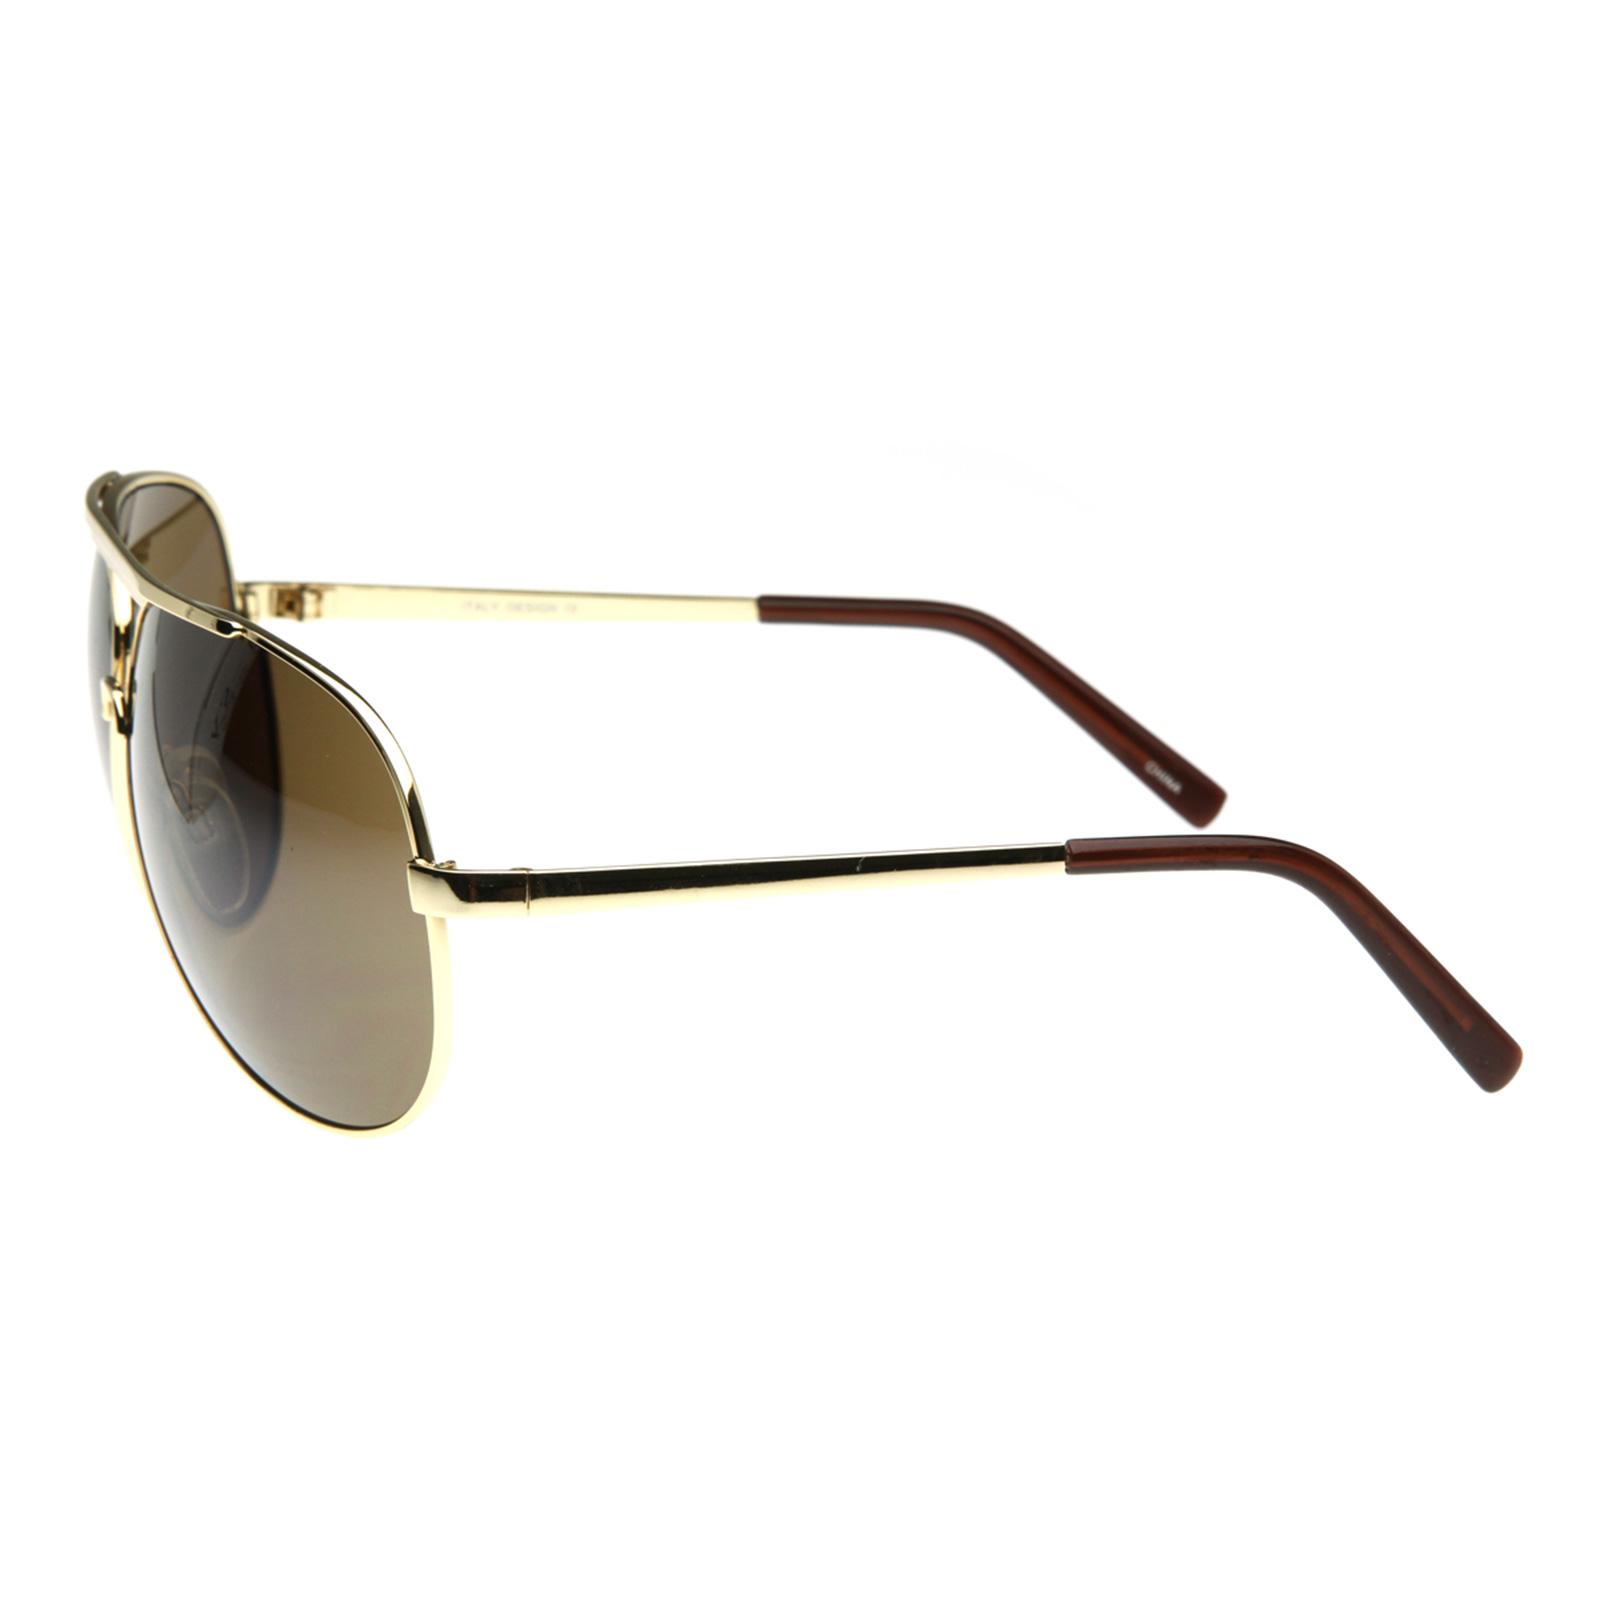 3c11ad4873 Metal Thin Frame Oversize Mirrored Aviator Sunglasses 1580 70mm on ...